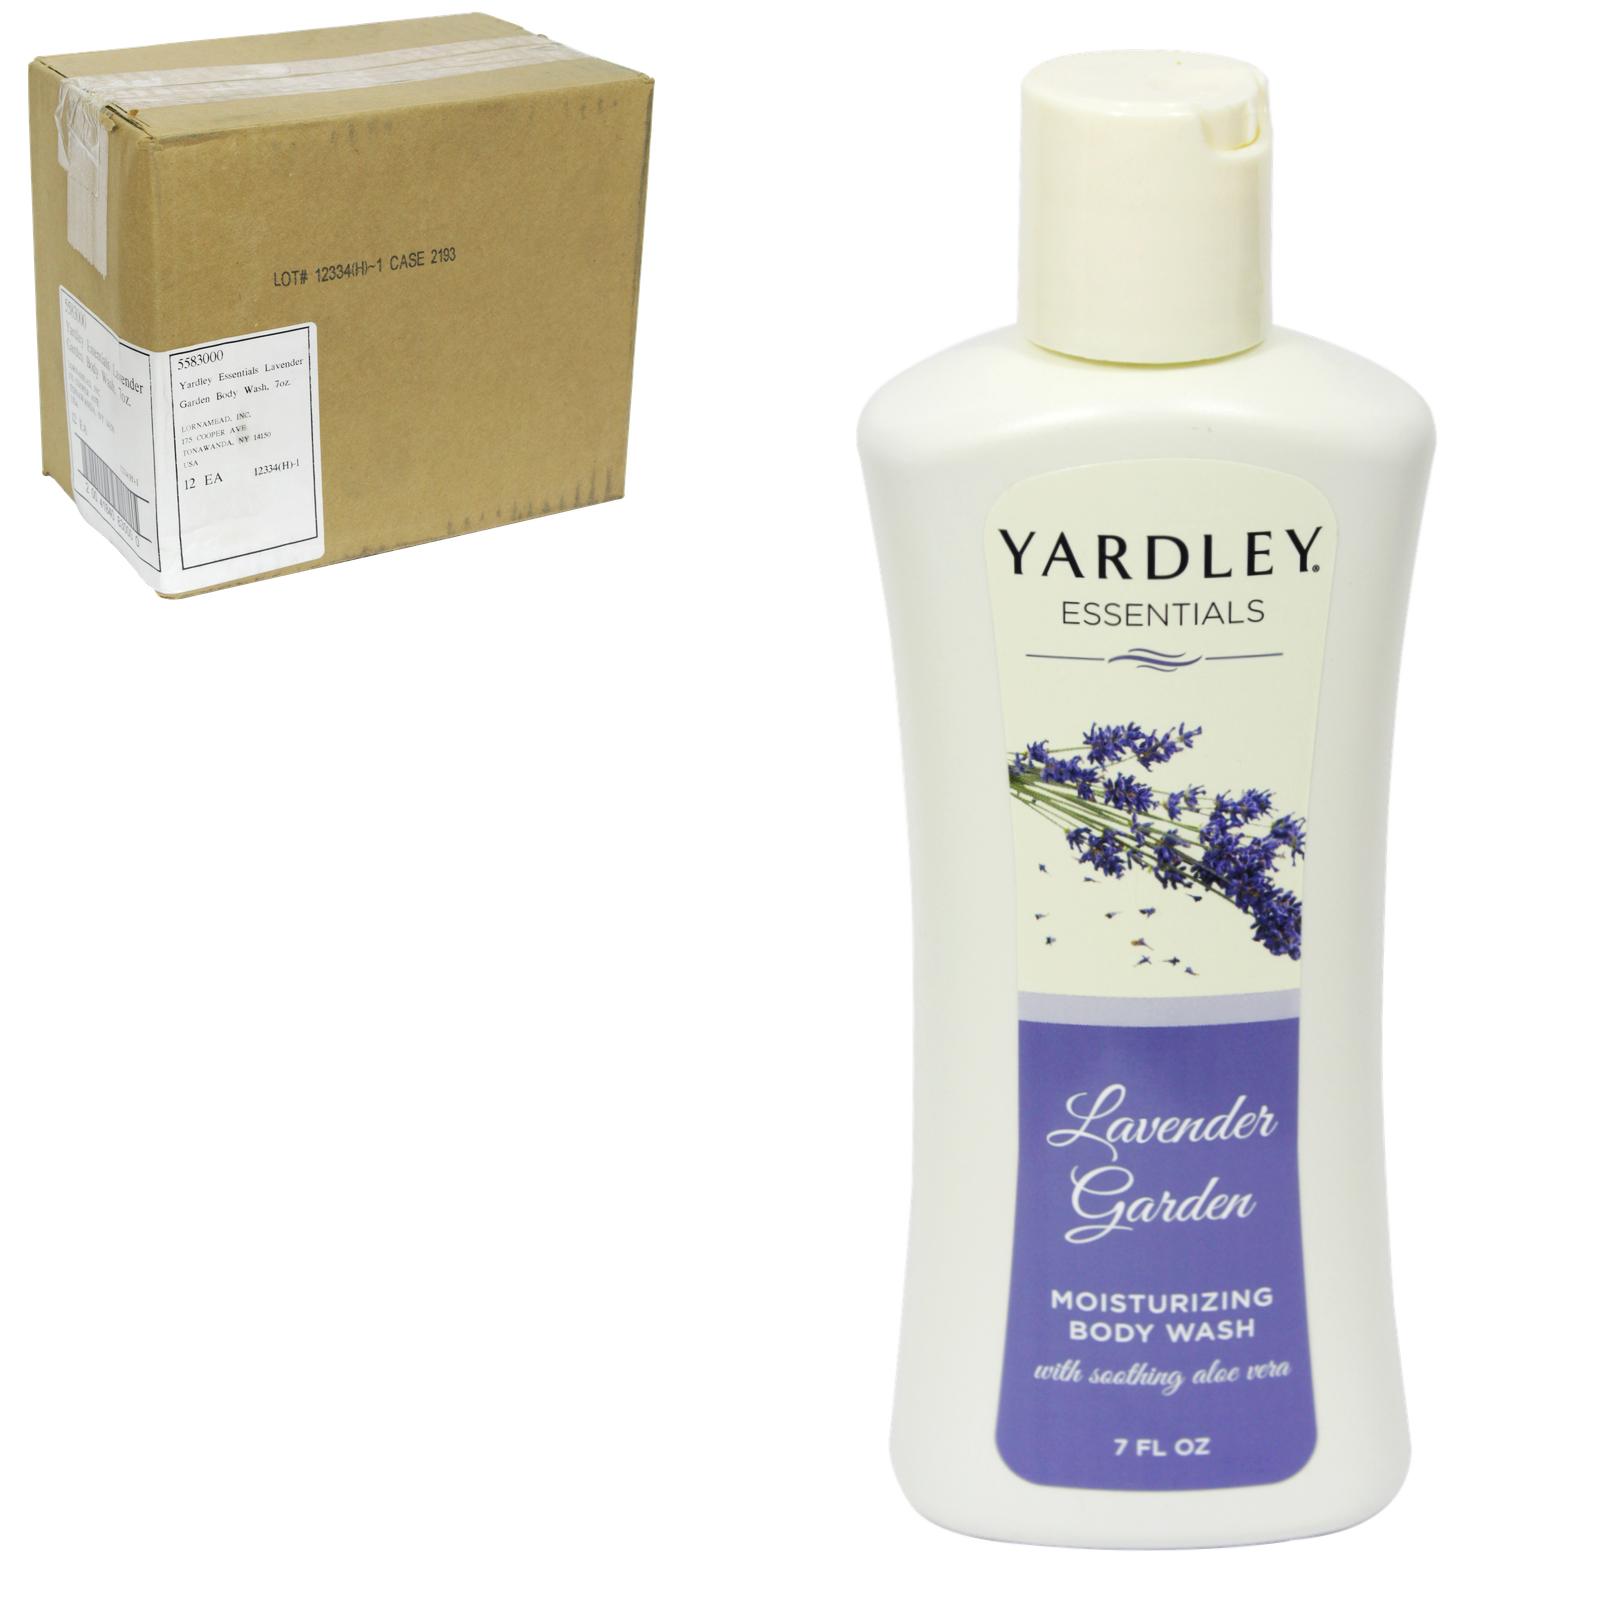 YARDLEY BODYWASH LAVENDER GARDEN X12